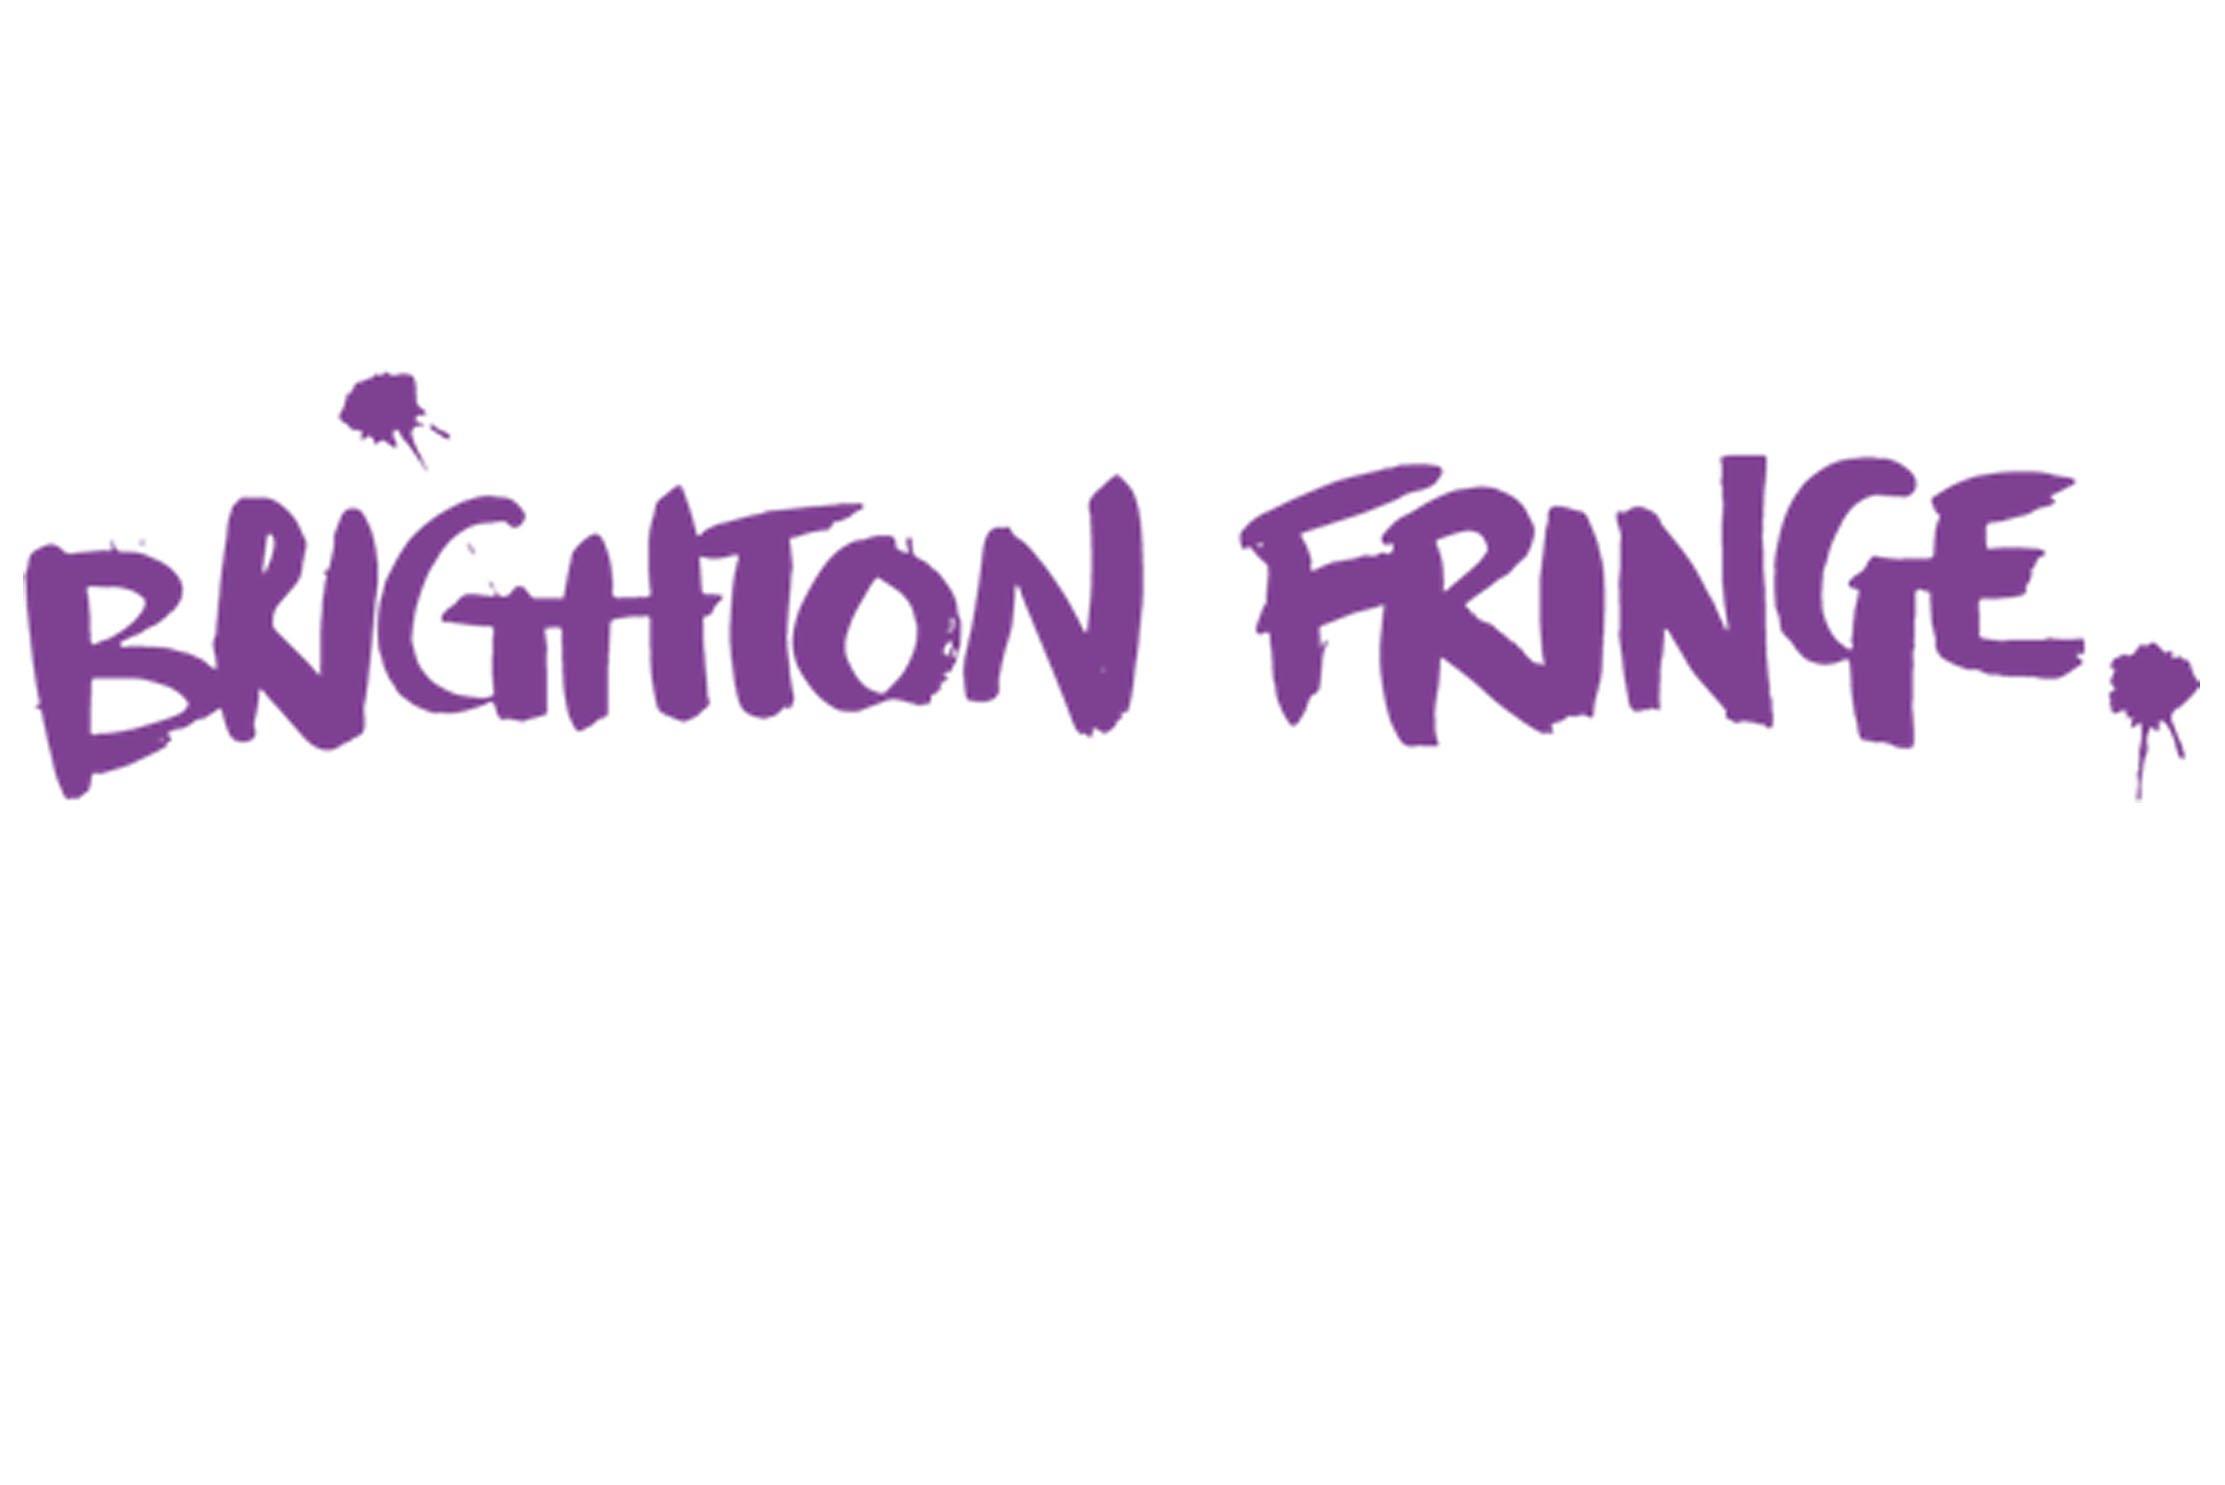 Brighton Fringe 2020 has announced postponing its annual event until Sept/Oct